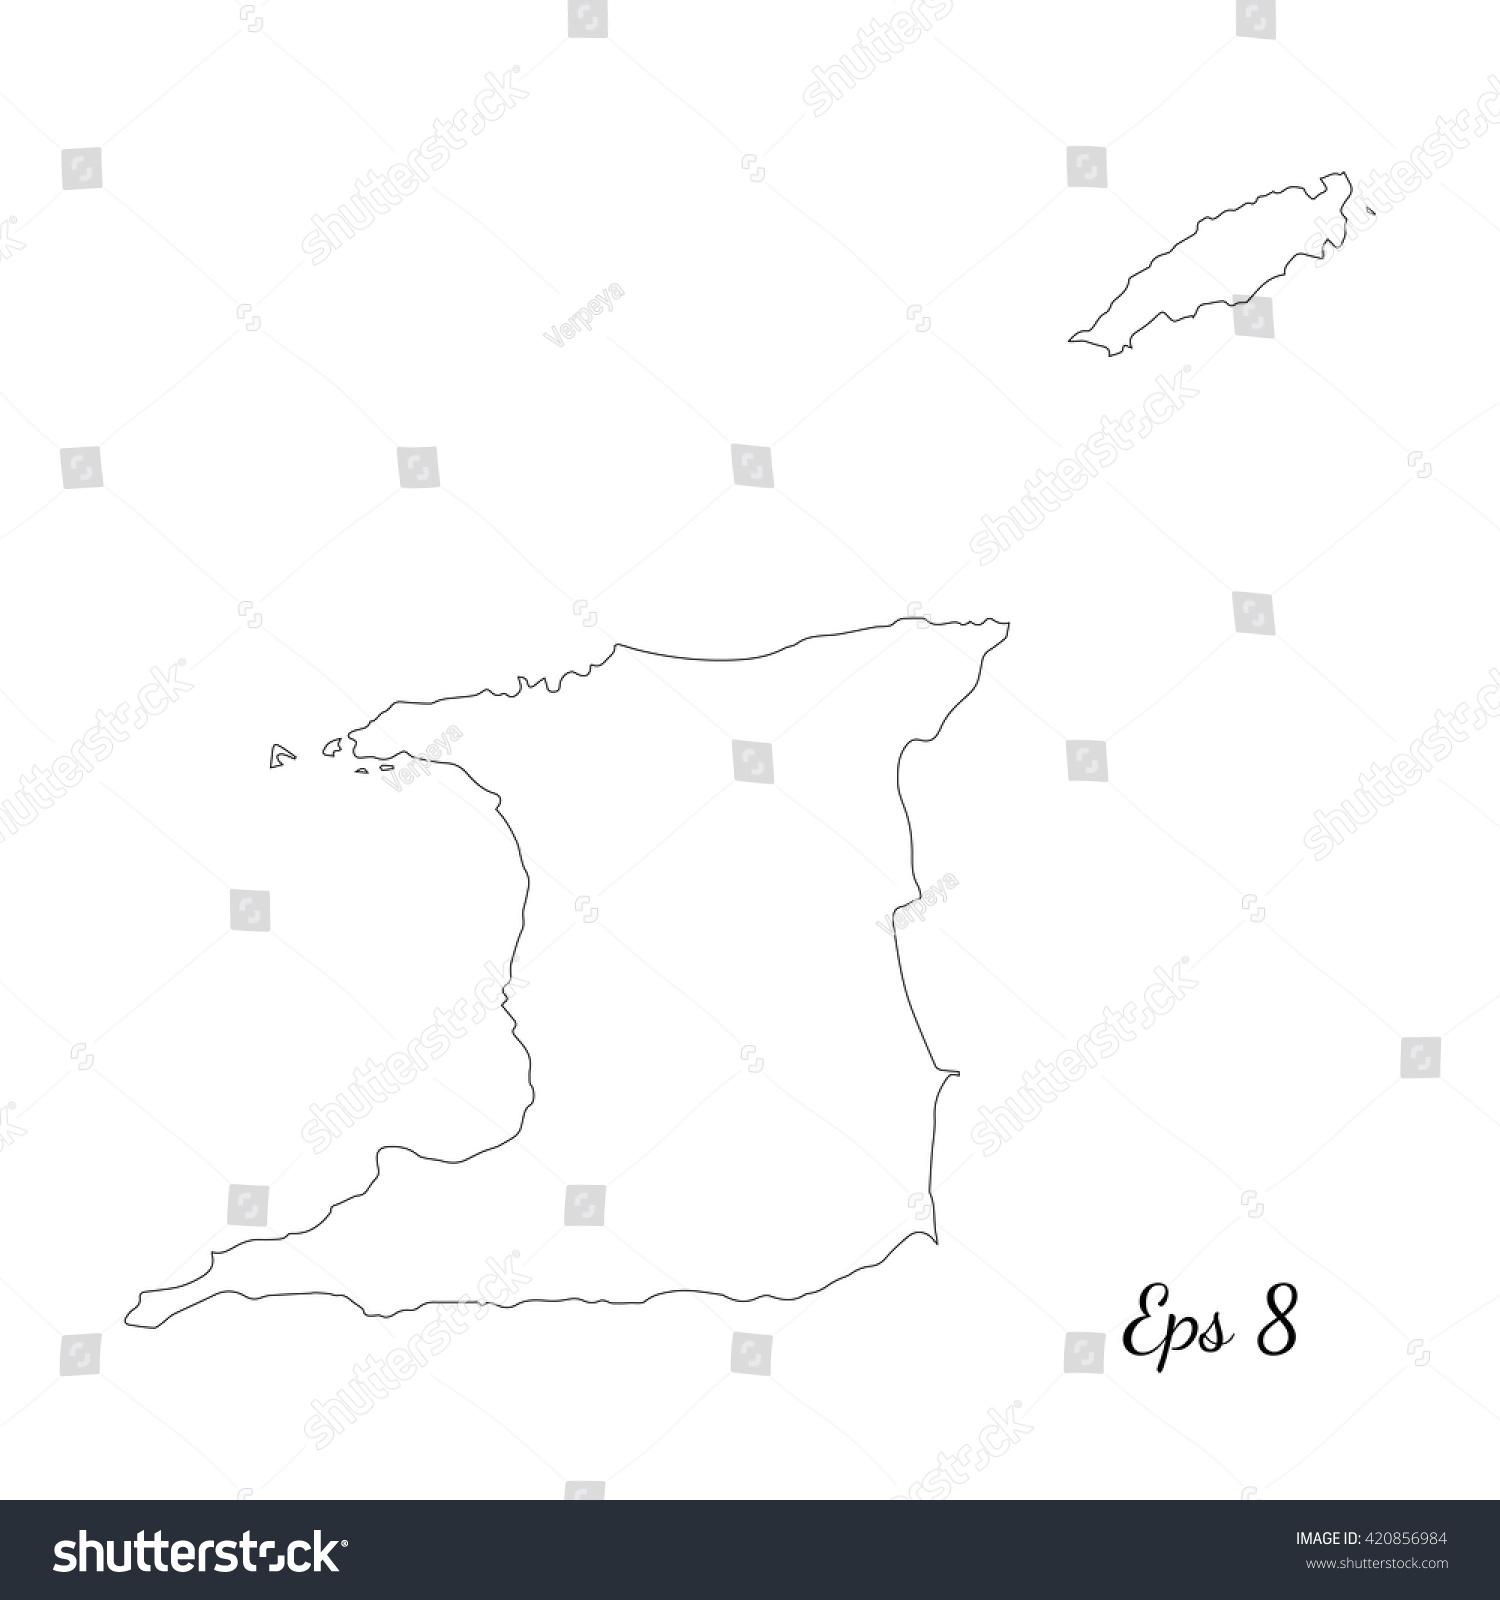 Vector Map Trinidad Tobago Outline Map Stock Vector - Outline map